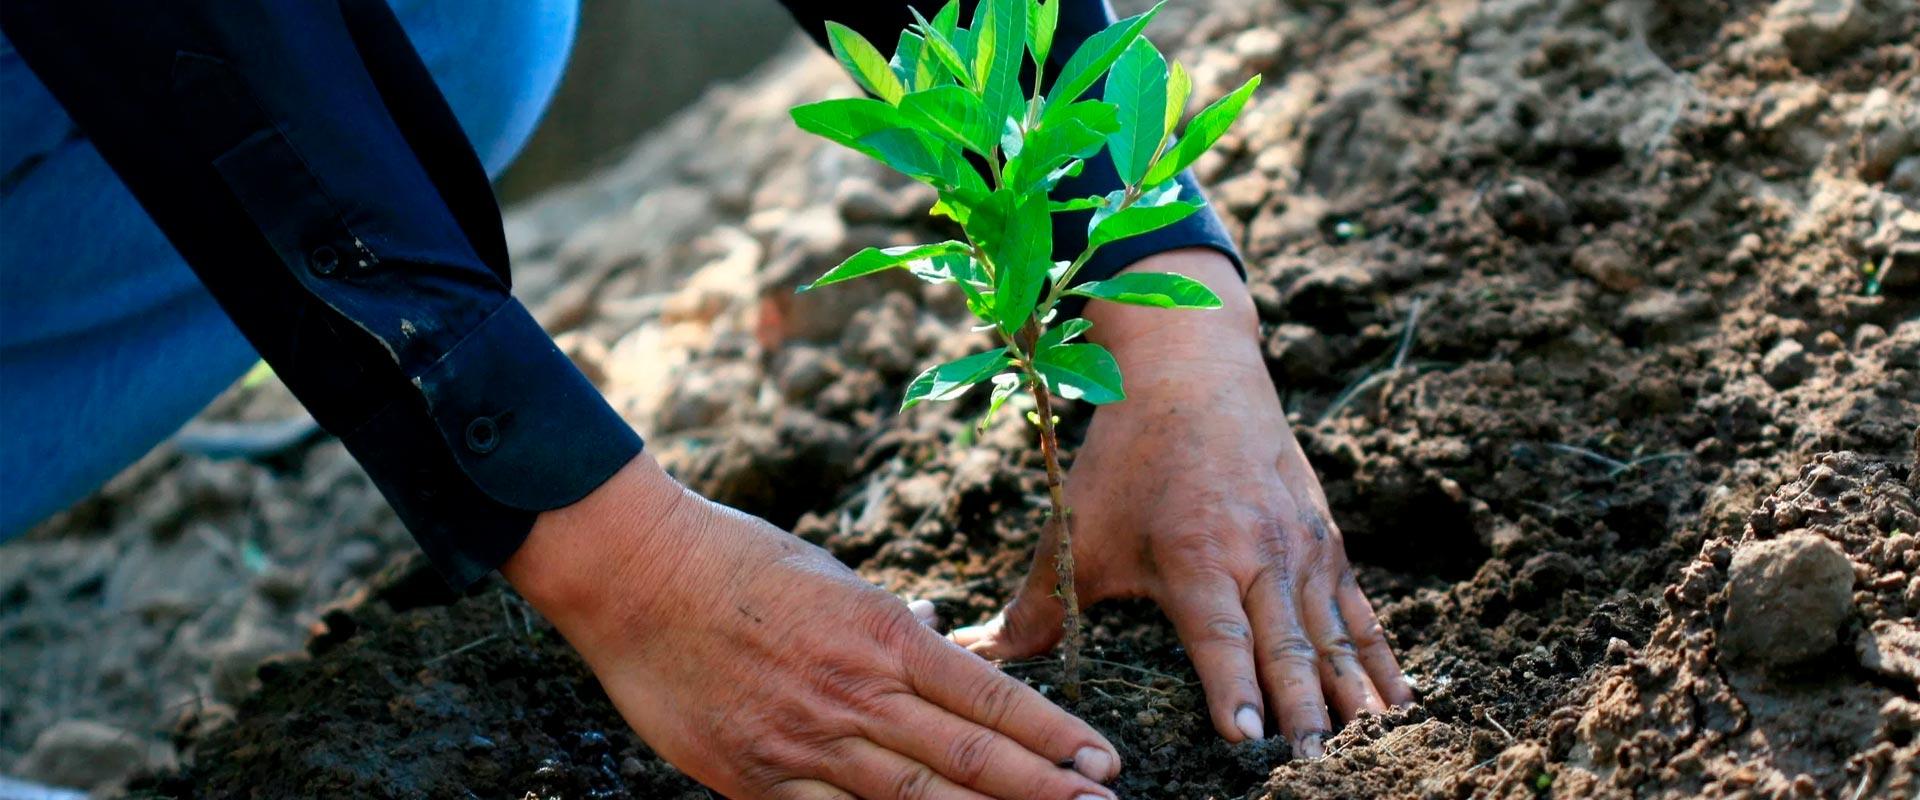 Respeto medioambiental